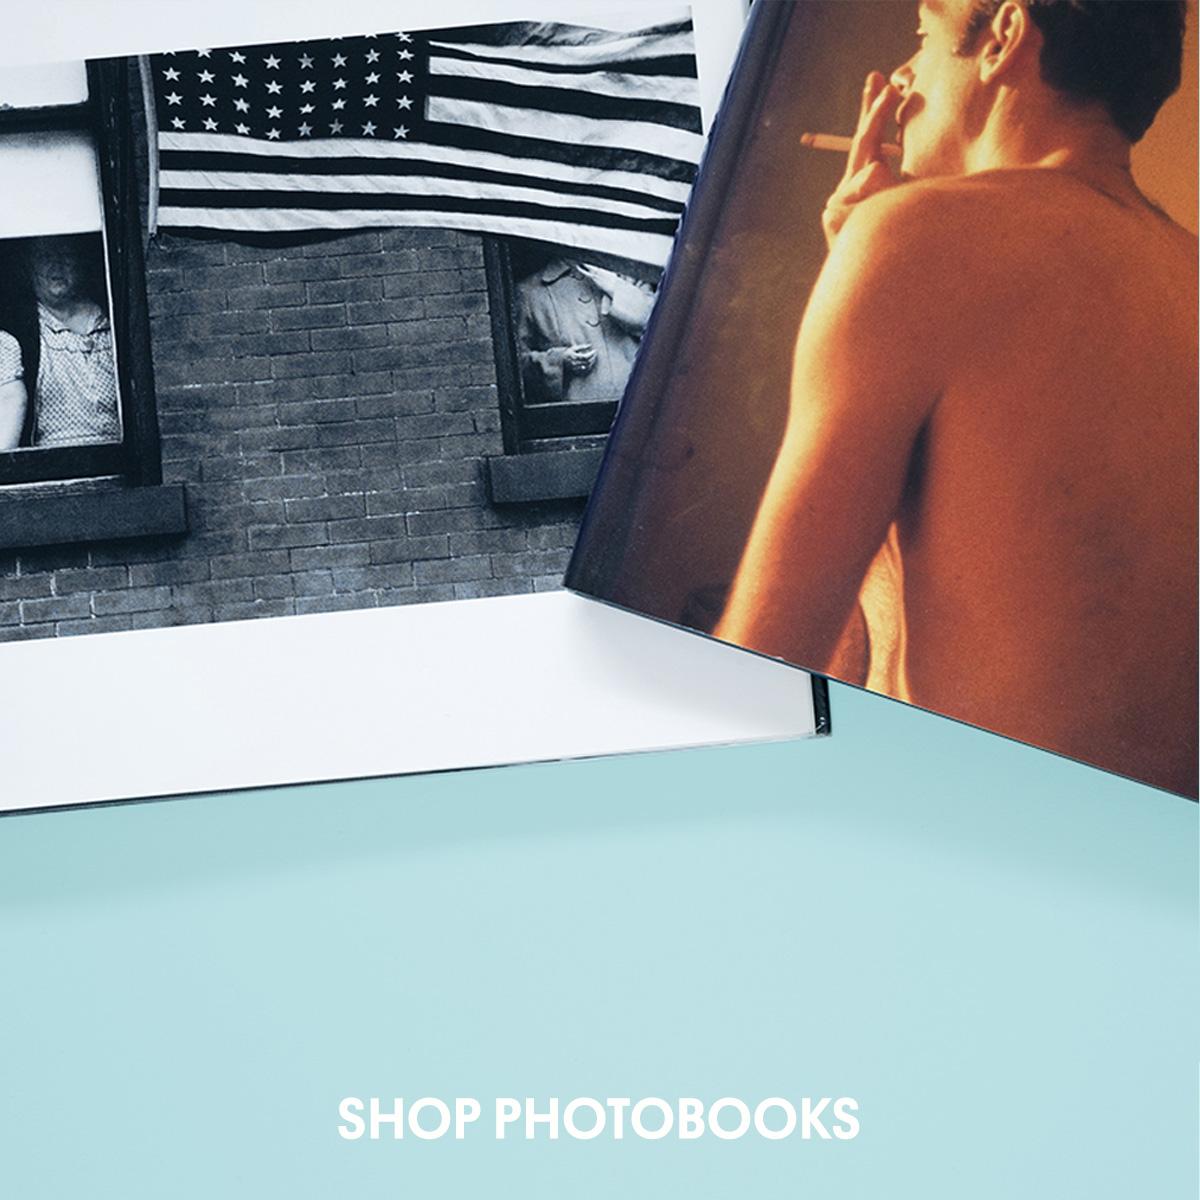 Shop Photobooks at Parallax Photographic Coop